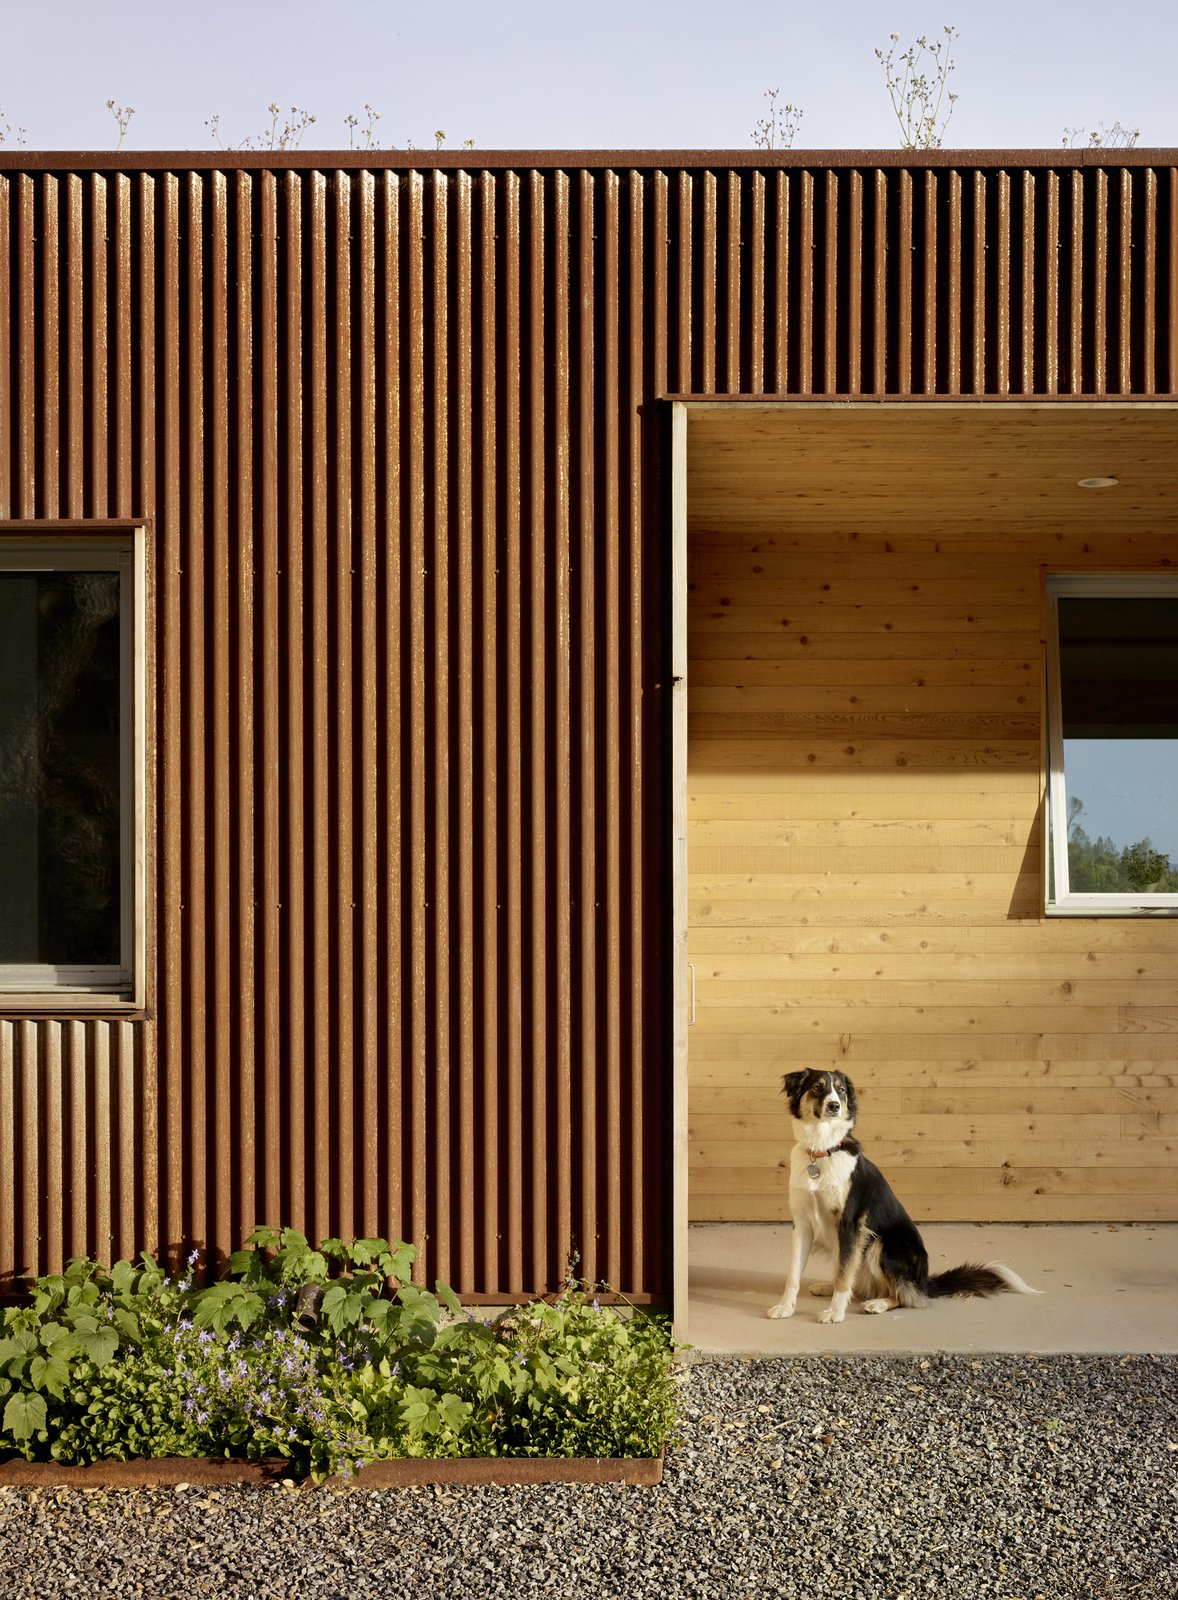 #TurnbullGriffinHaesloop #exterior #corten   Cloverdale Residence by Turnbull Griffin Haesloop Architects